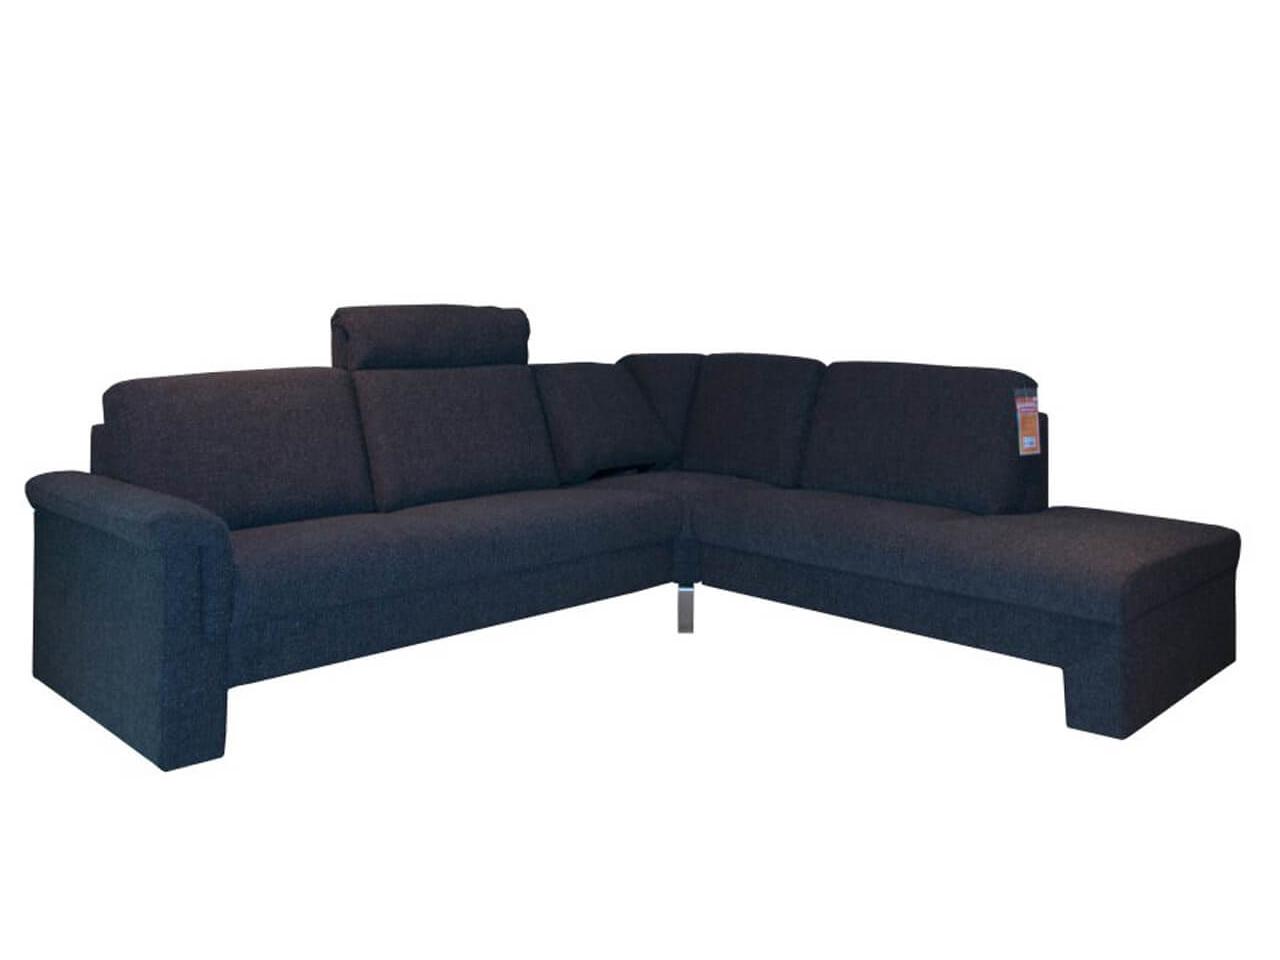 Ecksofa Select Plus mit dunkelgrauem Stoffbezug im Abverkauf